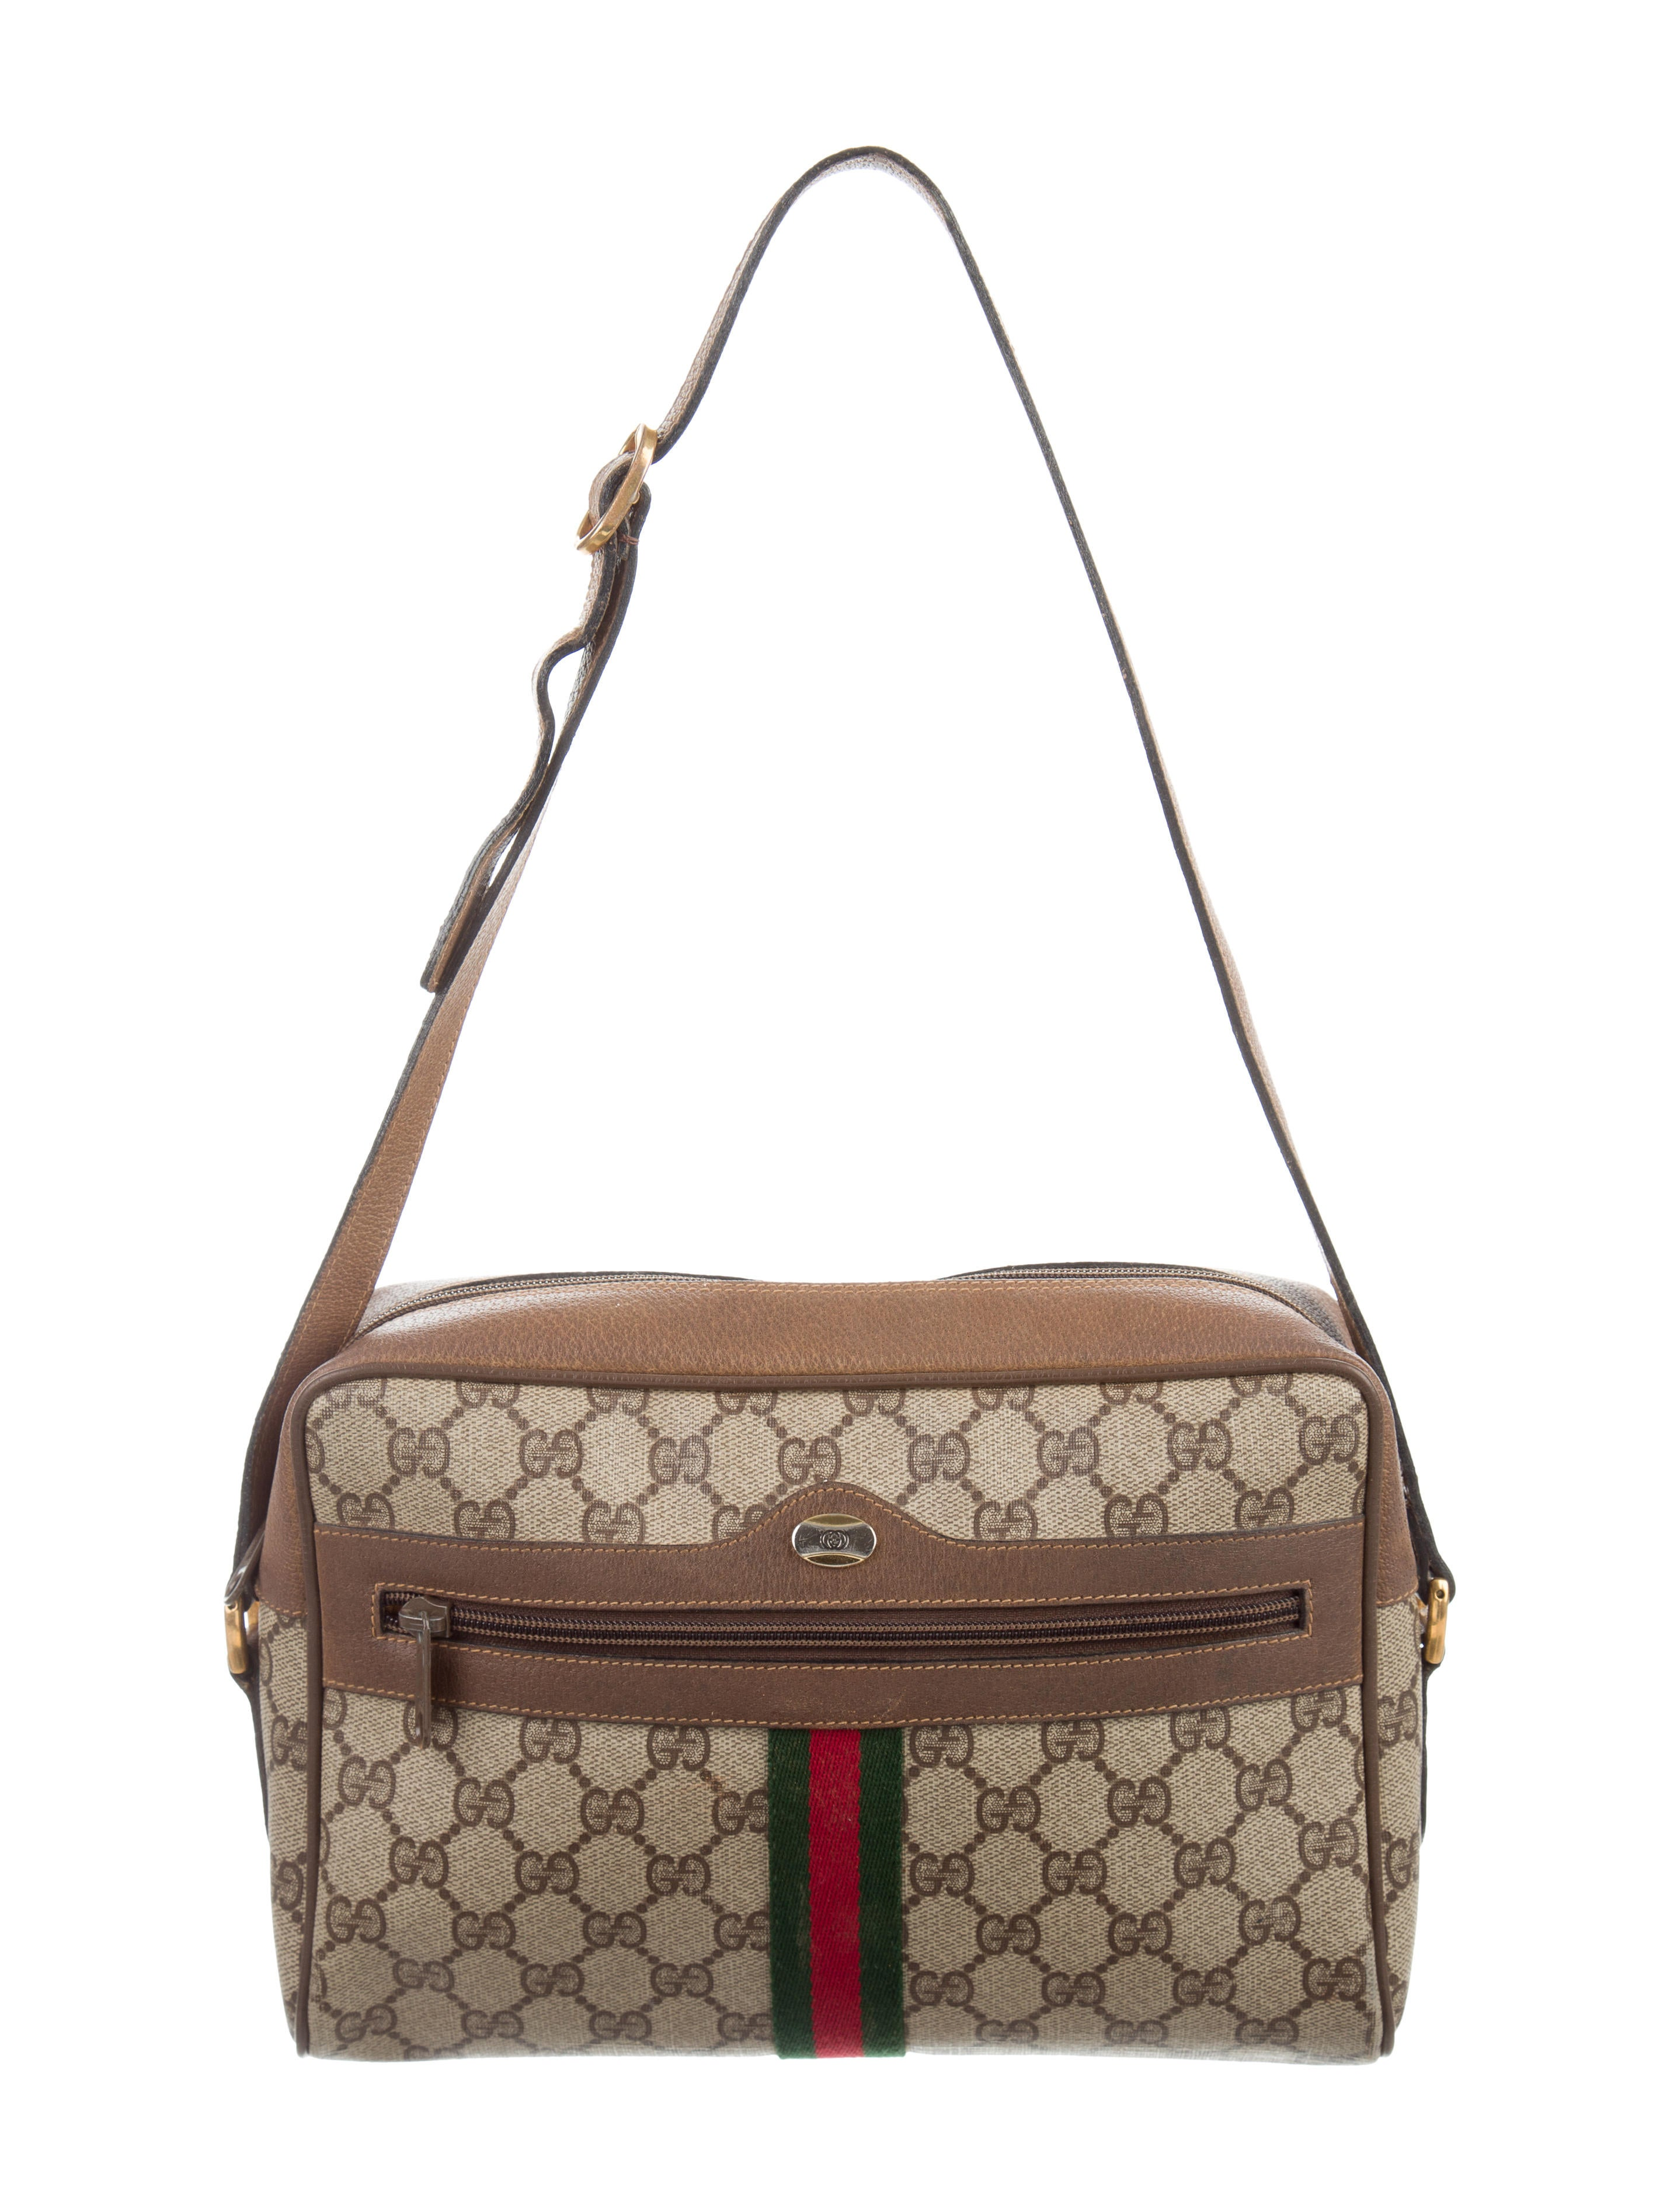 Gucci Vintage GG Plus Shoulder Bag - Handbags